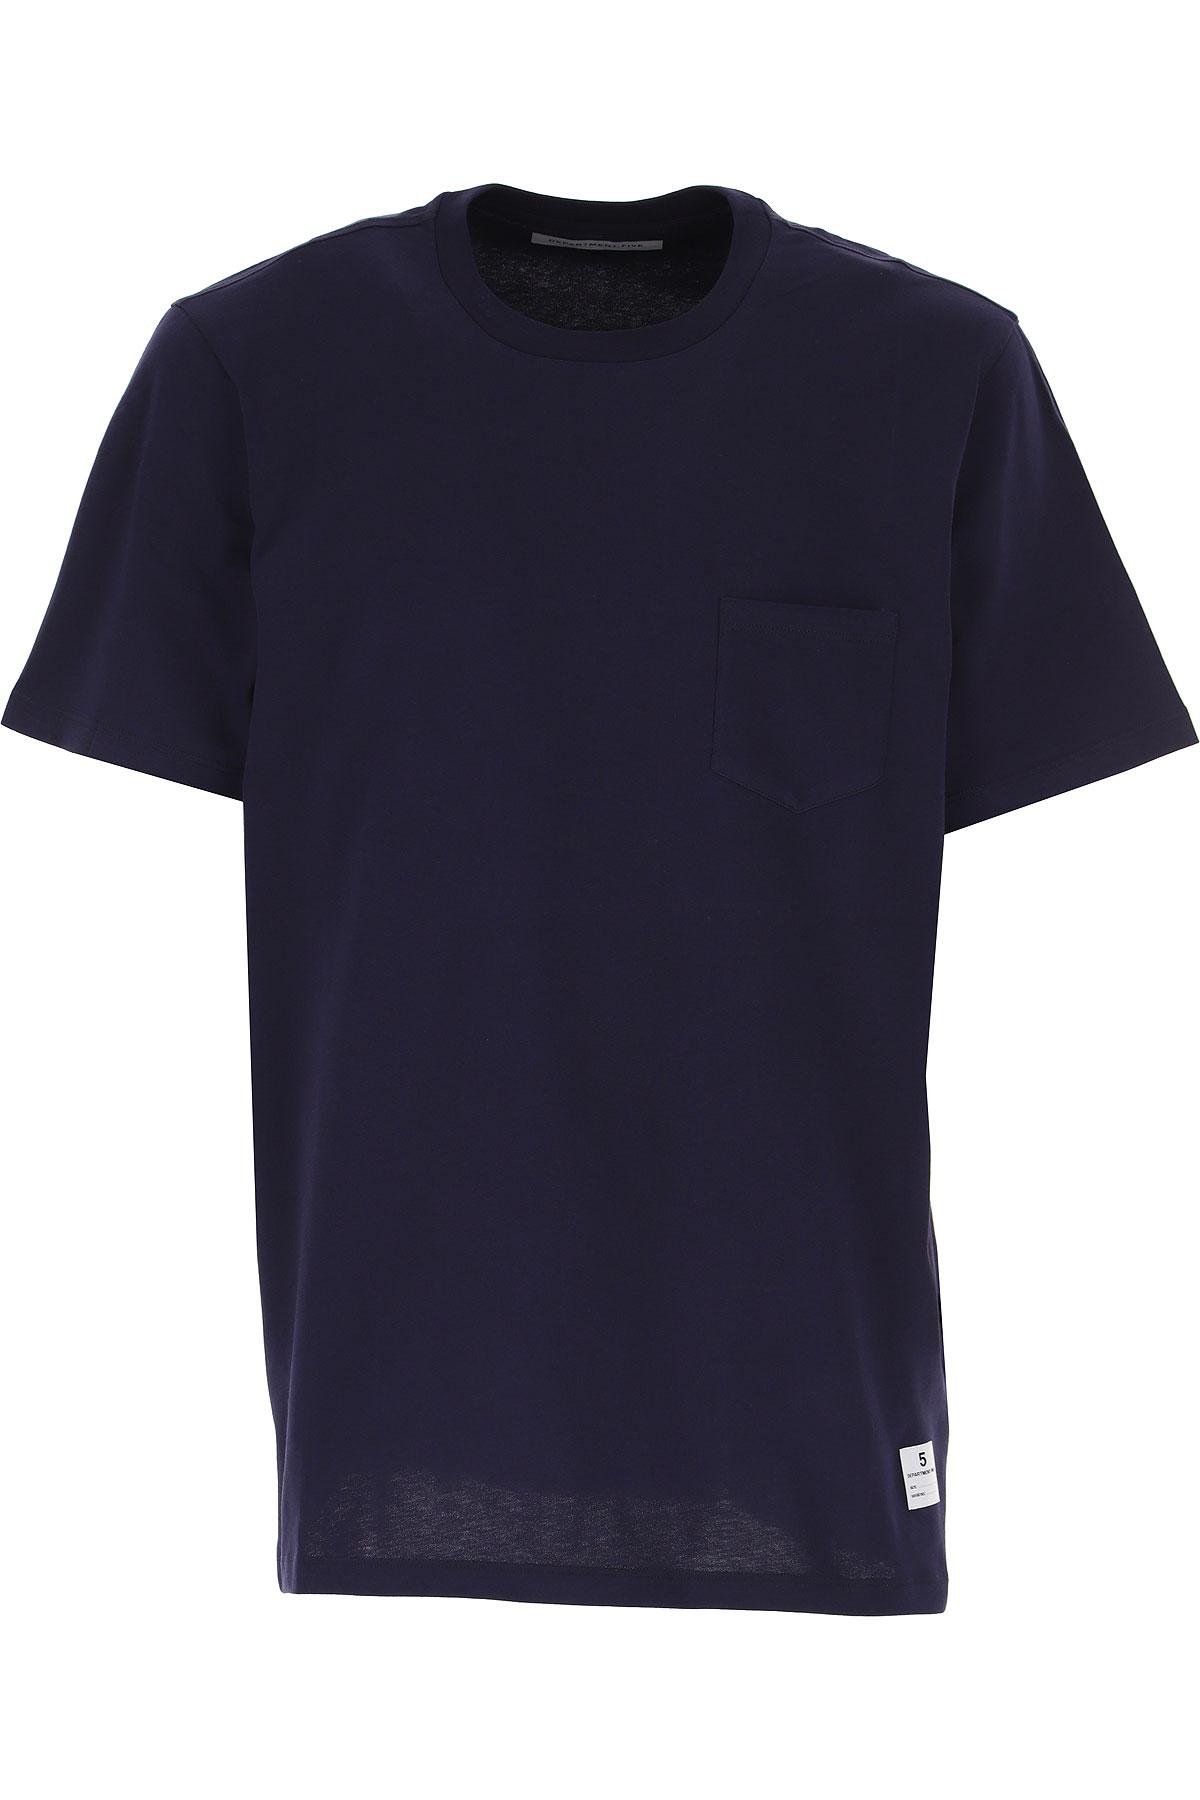 Department Five T-Shirt for Men On Sale, Midnight Blue, Cotton, 2019, L S